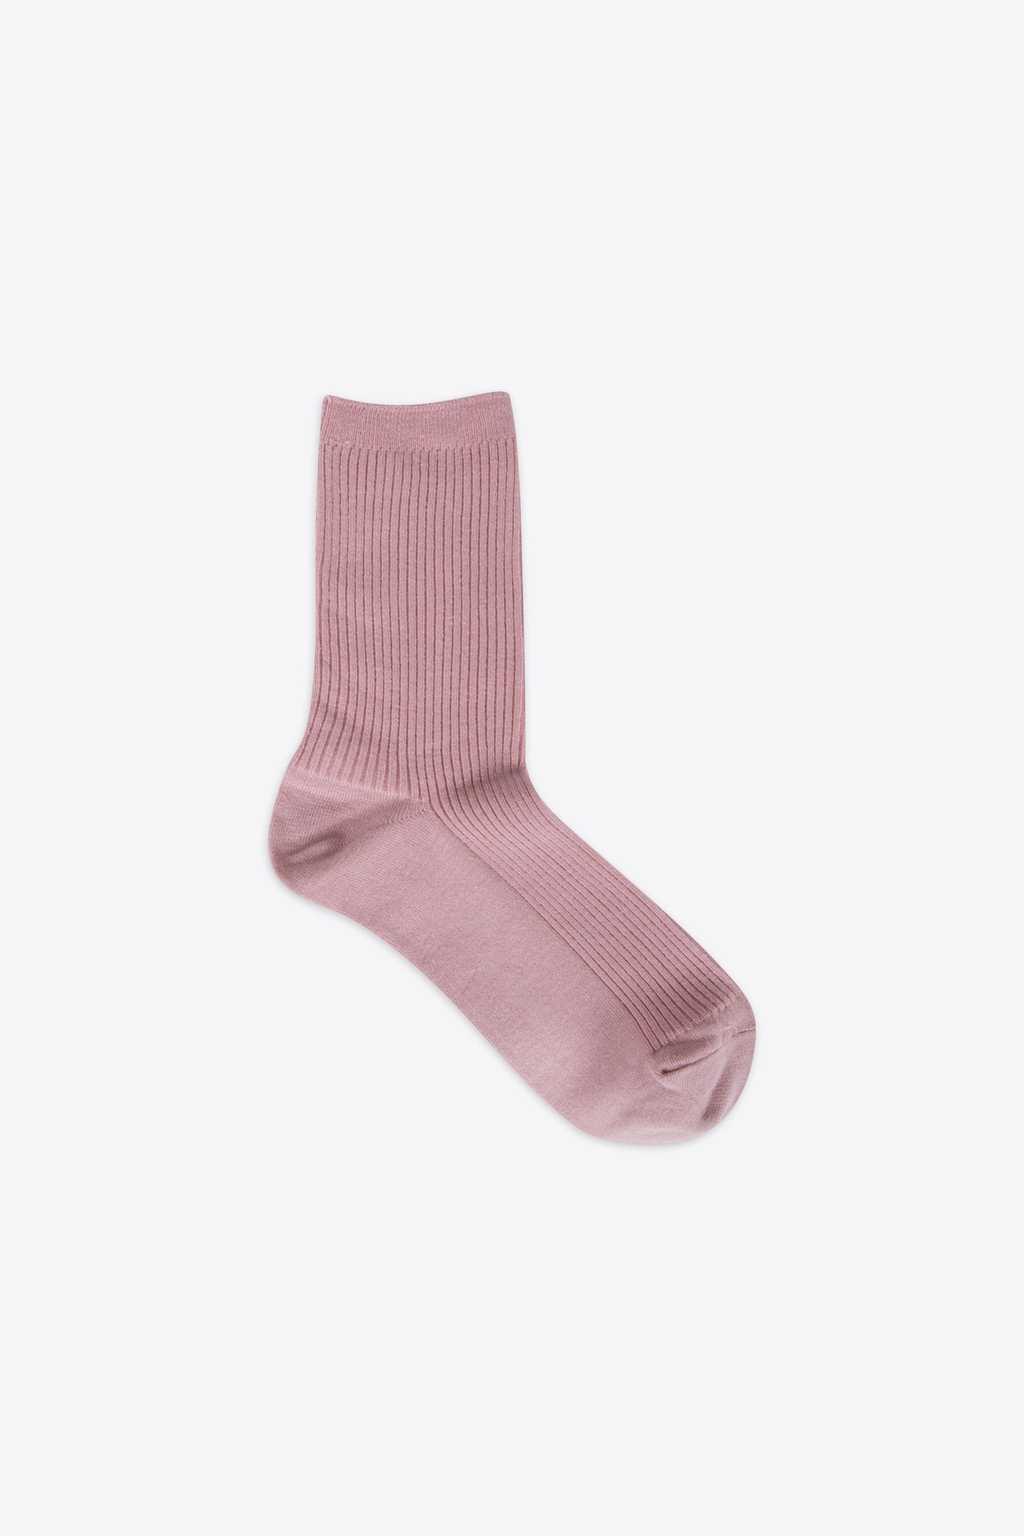 Sock H027 Pink 3